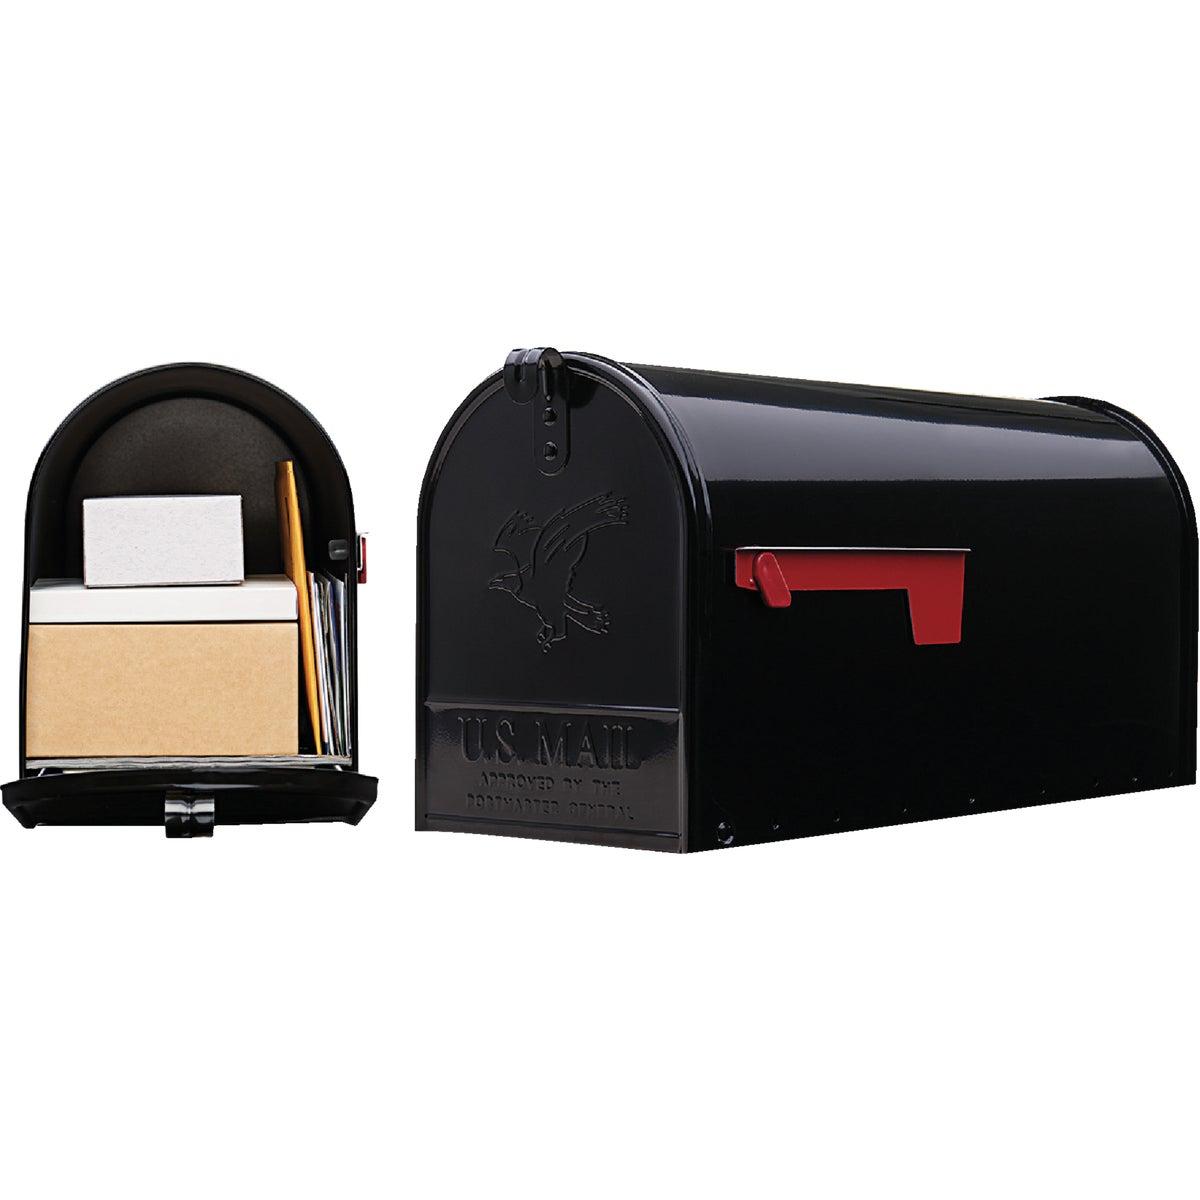 BLACK T2 MAILBOX